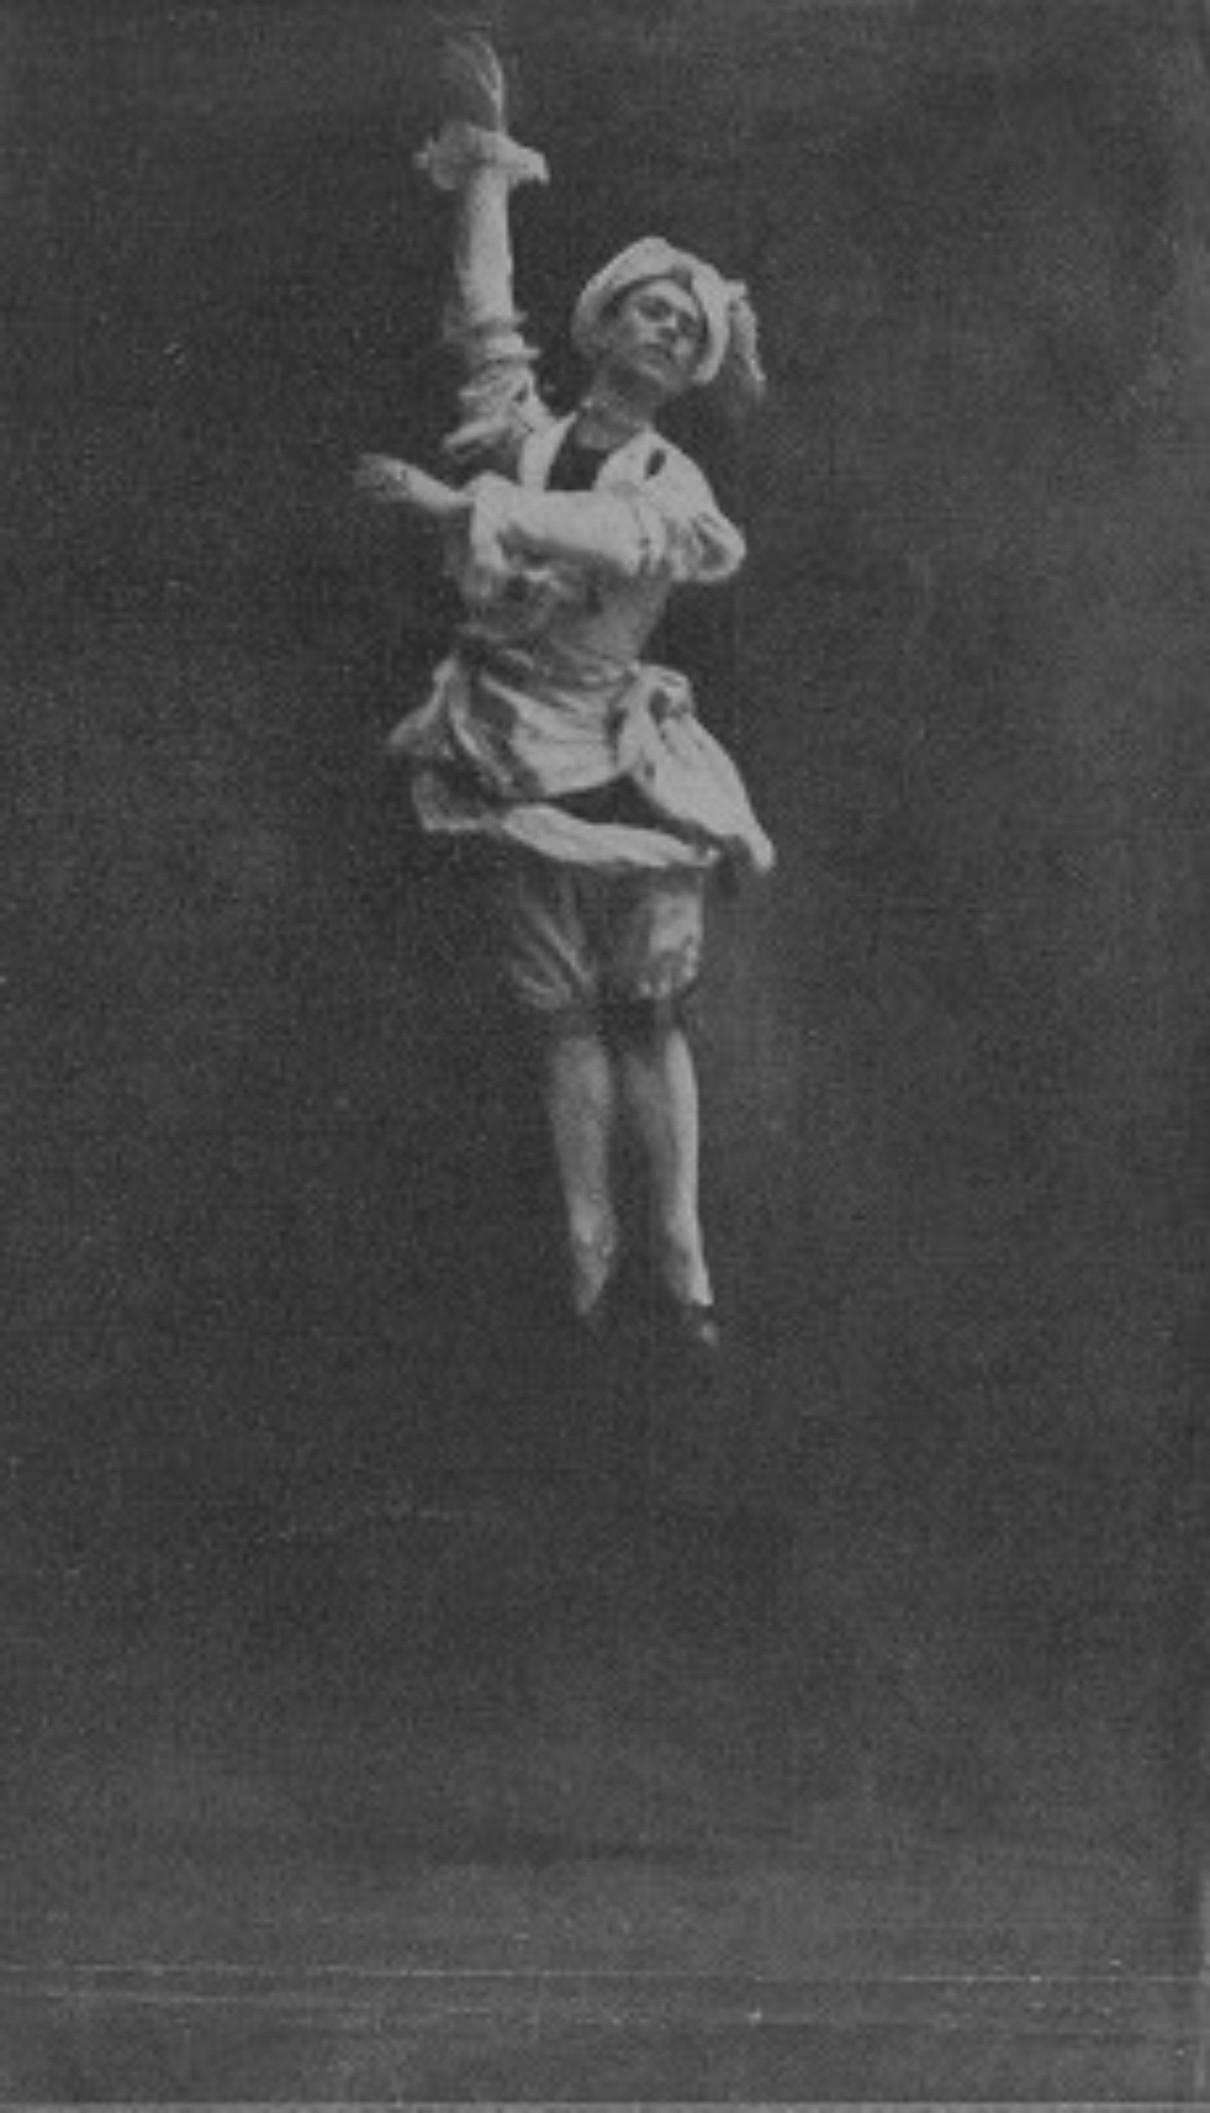 615aba65e0511c448dd548c478d52ded--ballet-russe-russian-ballet_edited.jpg